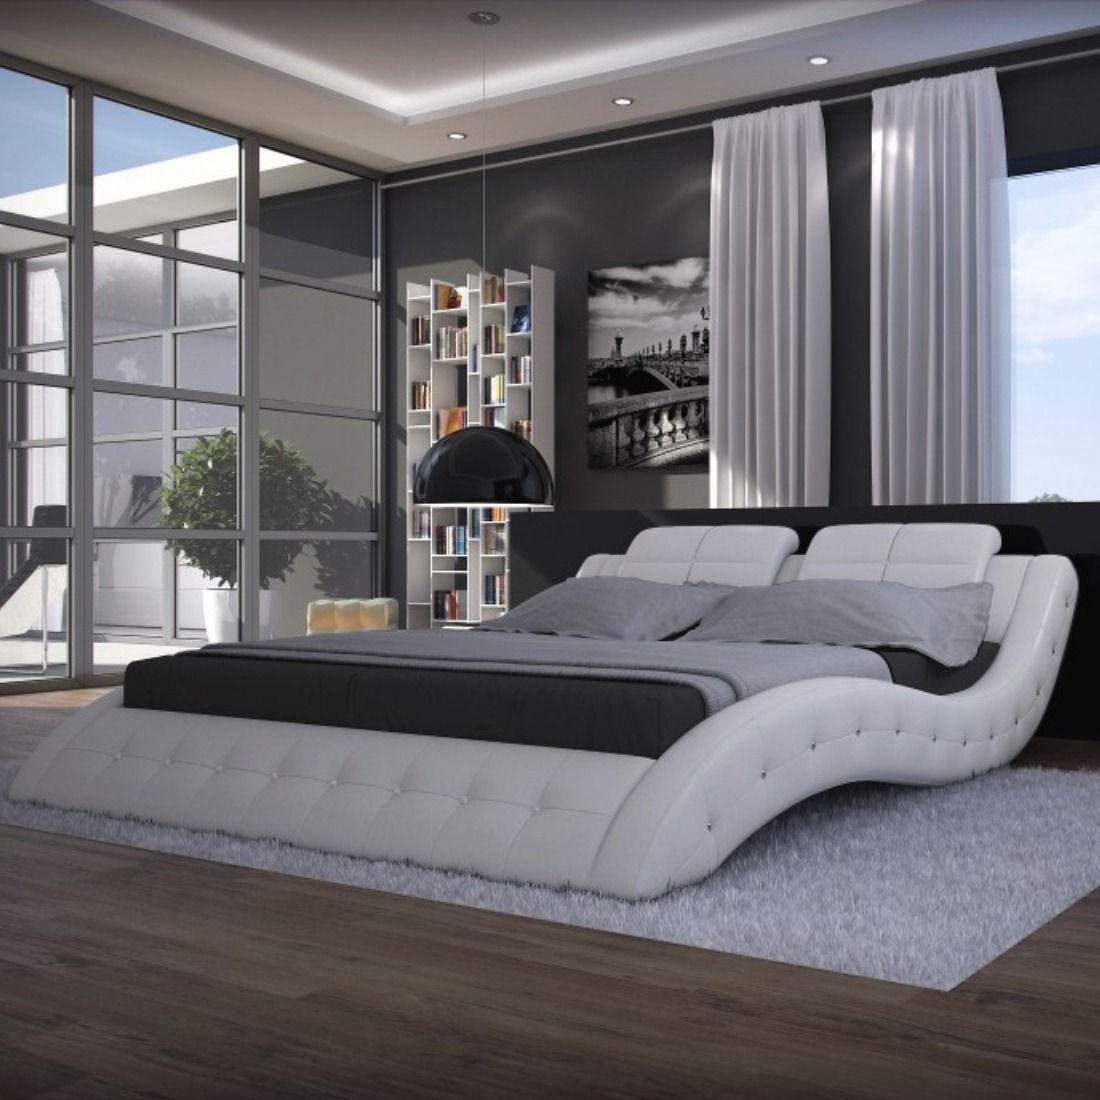 Full Size of Schlafzimmer Komplett Modern Luxus Massiv Set Weiss Wasserbett Mood In Wei Luxusschlafzimmer Kommoden Lampe Bett 160x200 Modernes Massivholz Moderne Wohnzimmer Schlafzimmer Komplett Modern